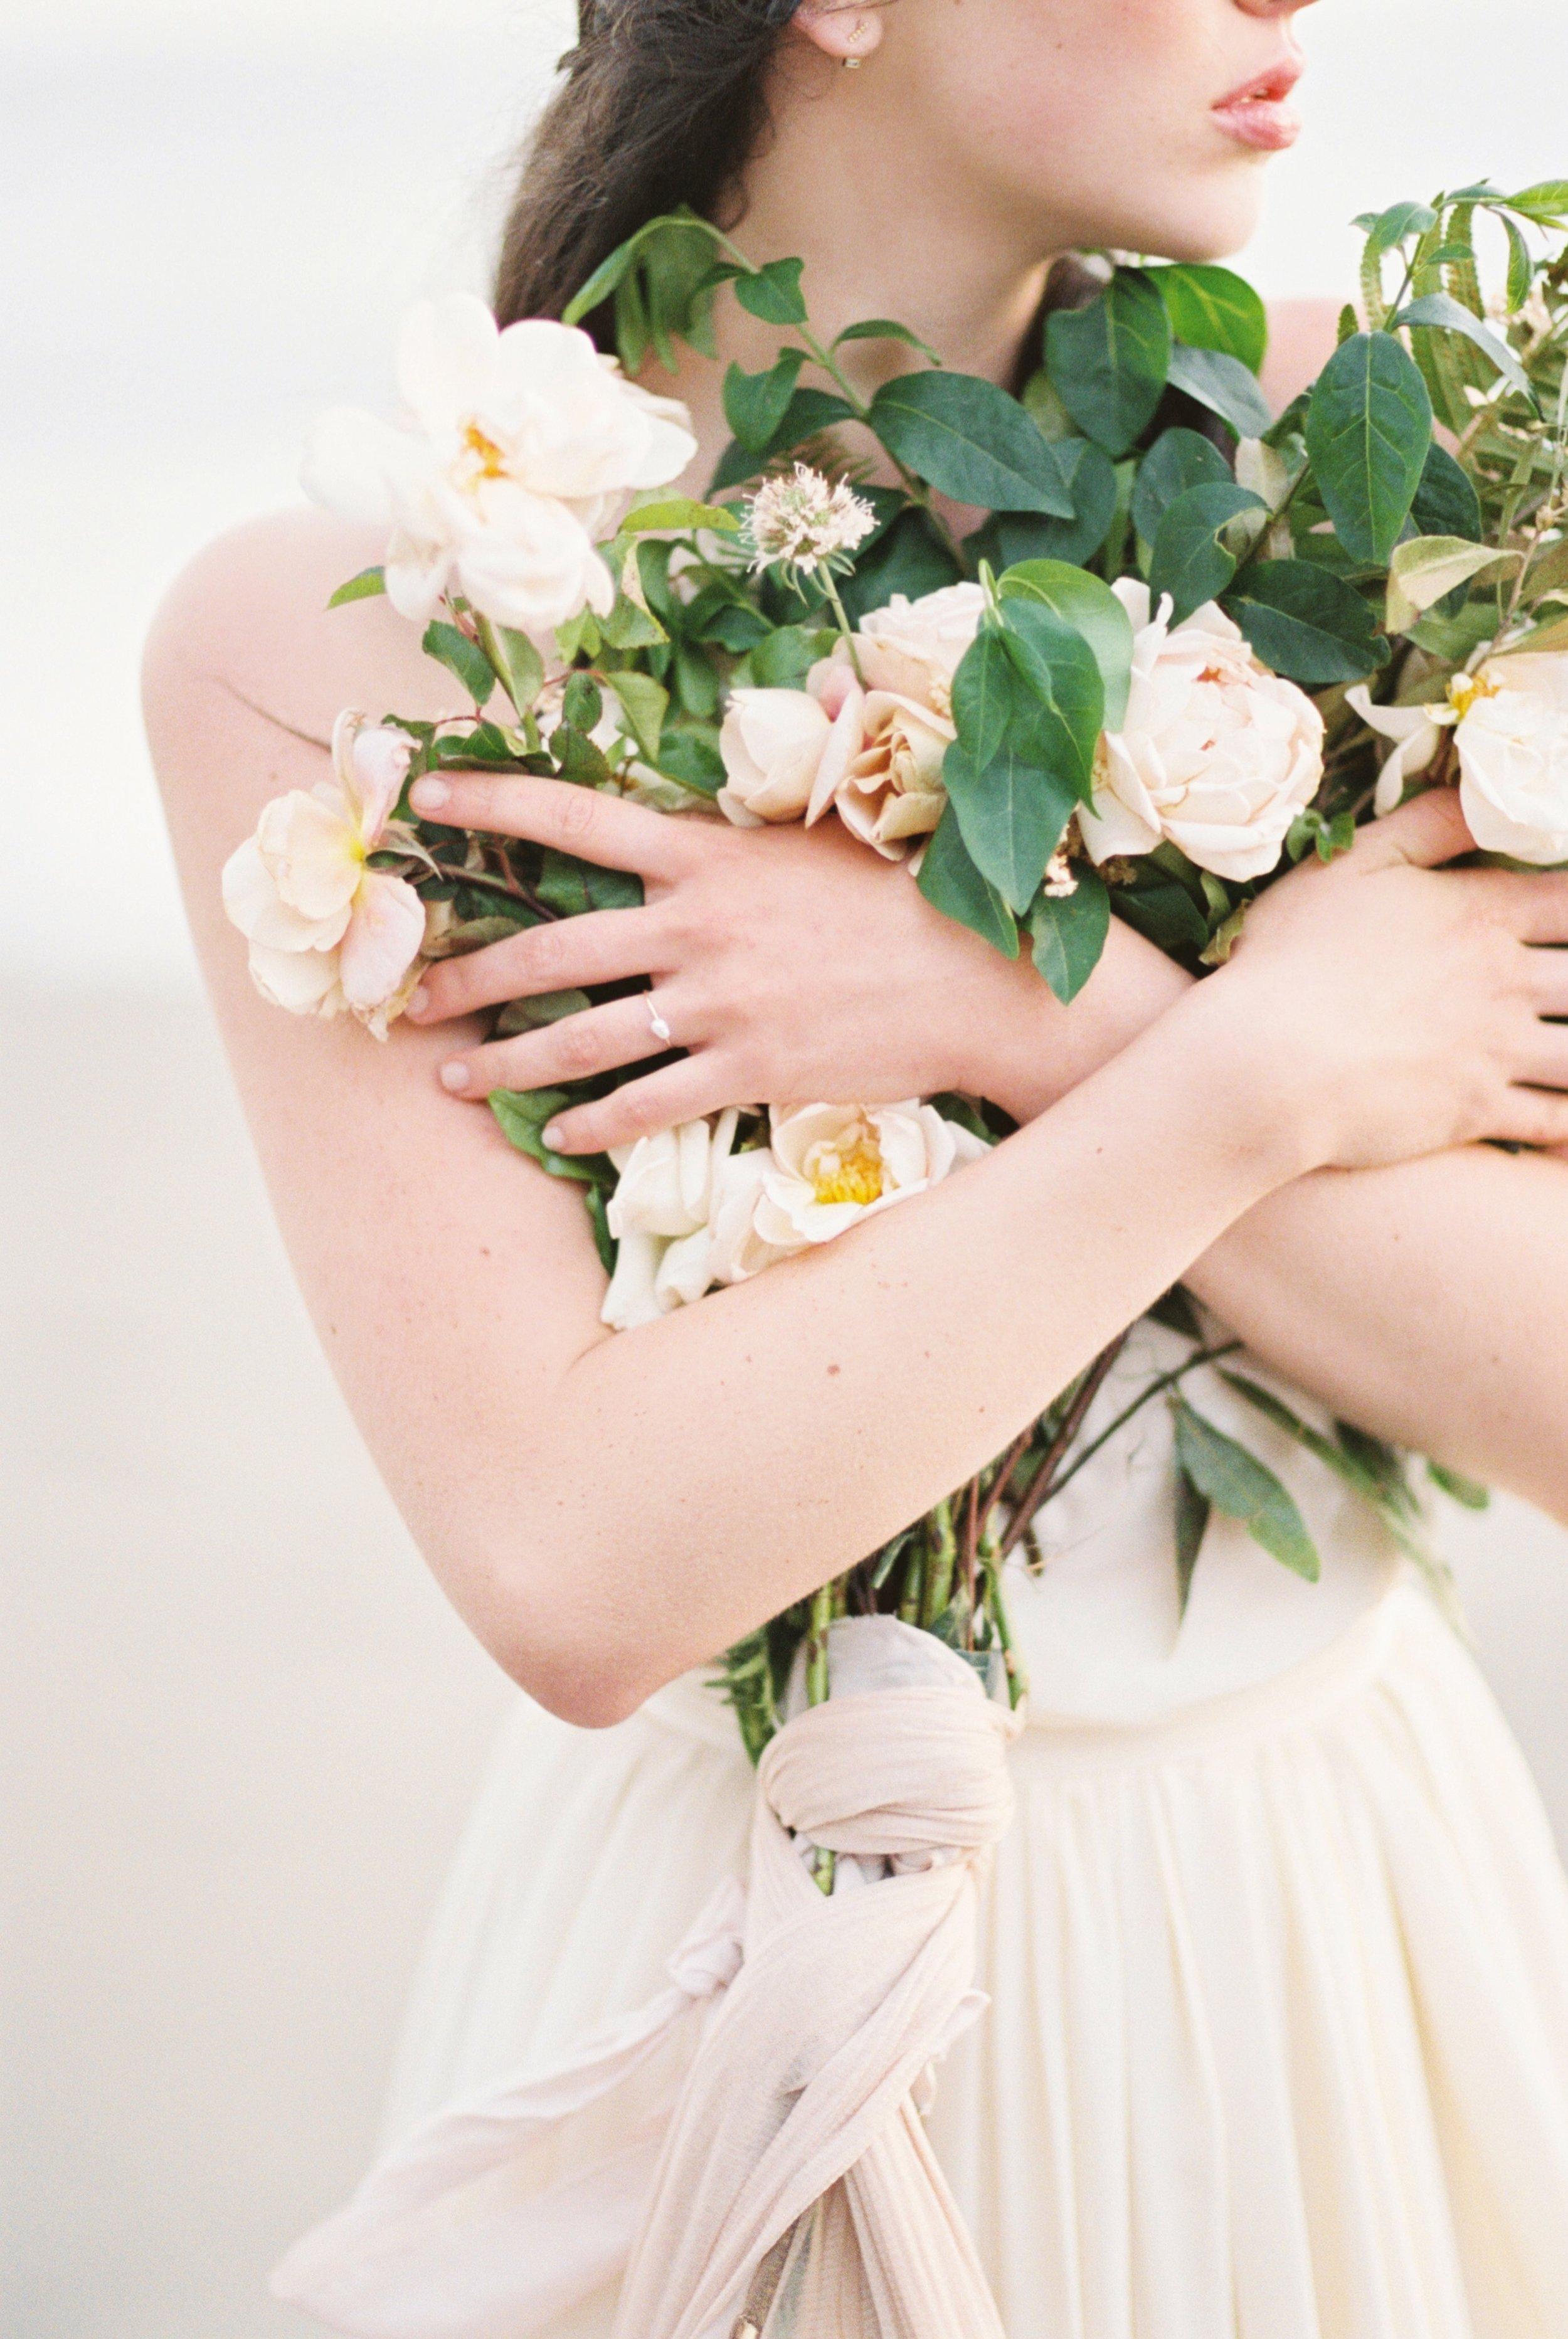 Seaside Wedding | Seaside Bridal Shoot | Erich McVey Workshop | Lisa Catherine Photography | Joy Wed | Fine Art Wedding blog | Organic Wedding Inspiration | Organic Wedding Bouquet